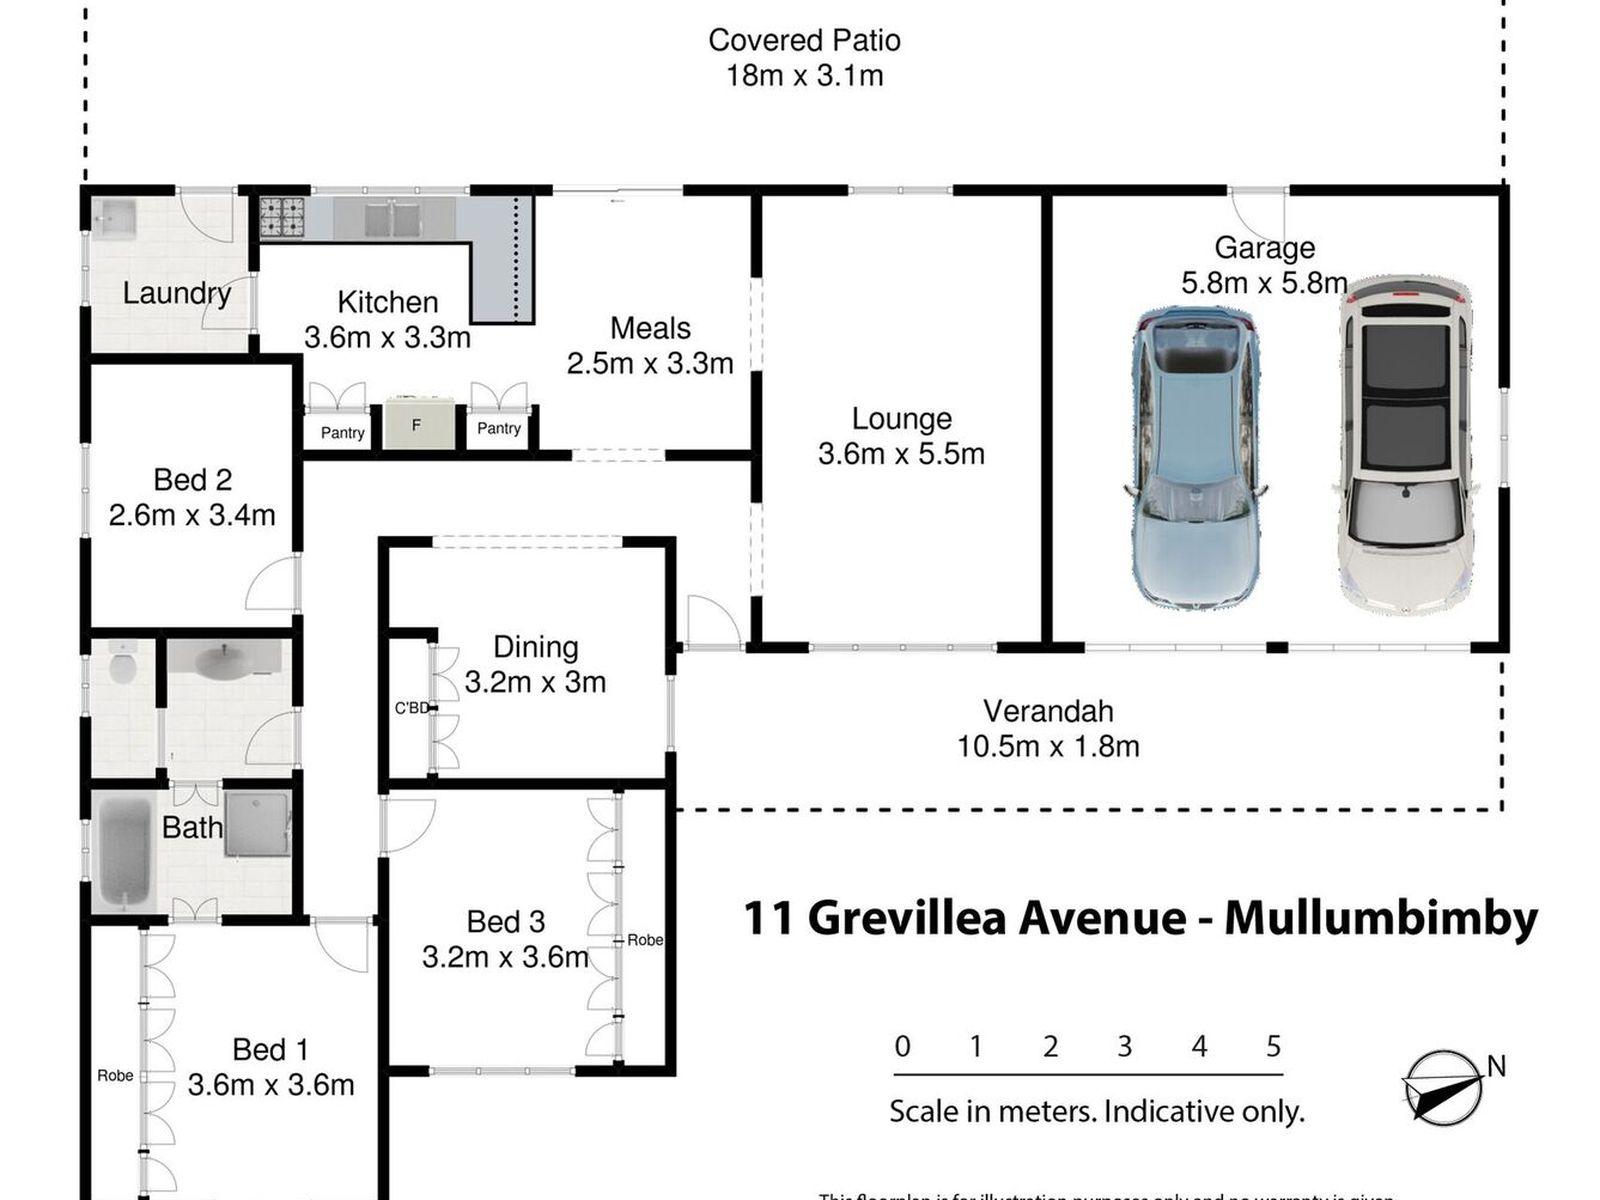 11 Grevillea Avenue, Mullumbimby